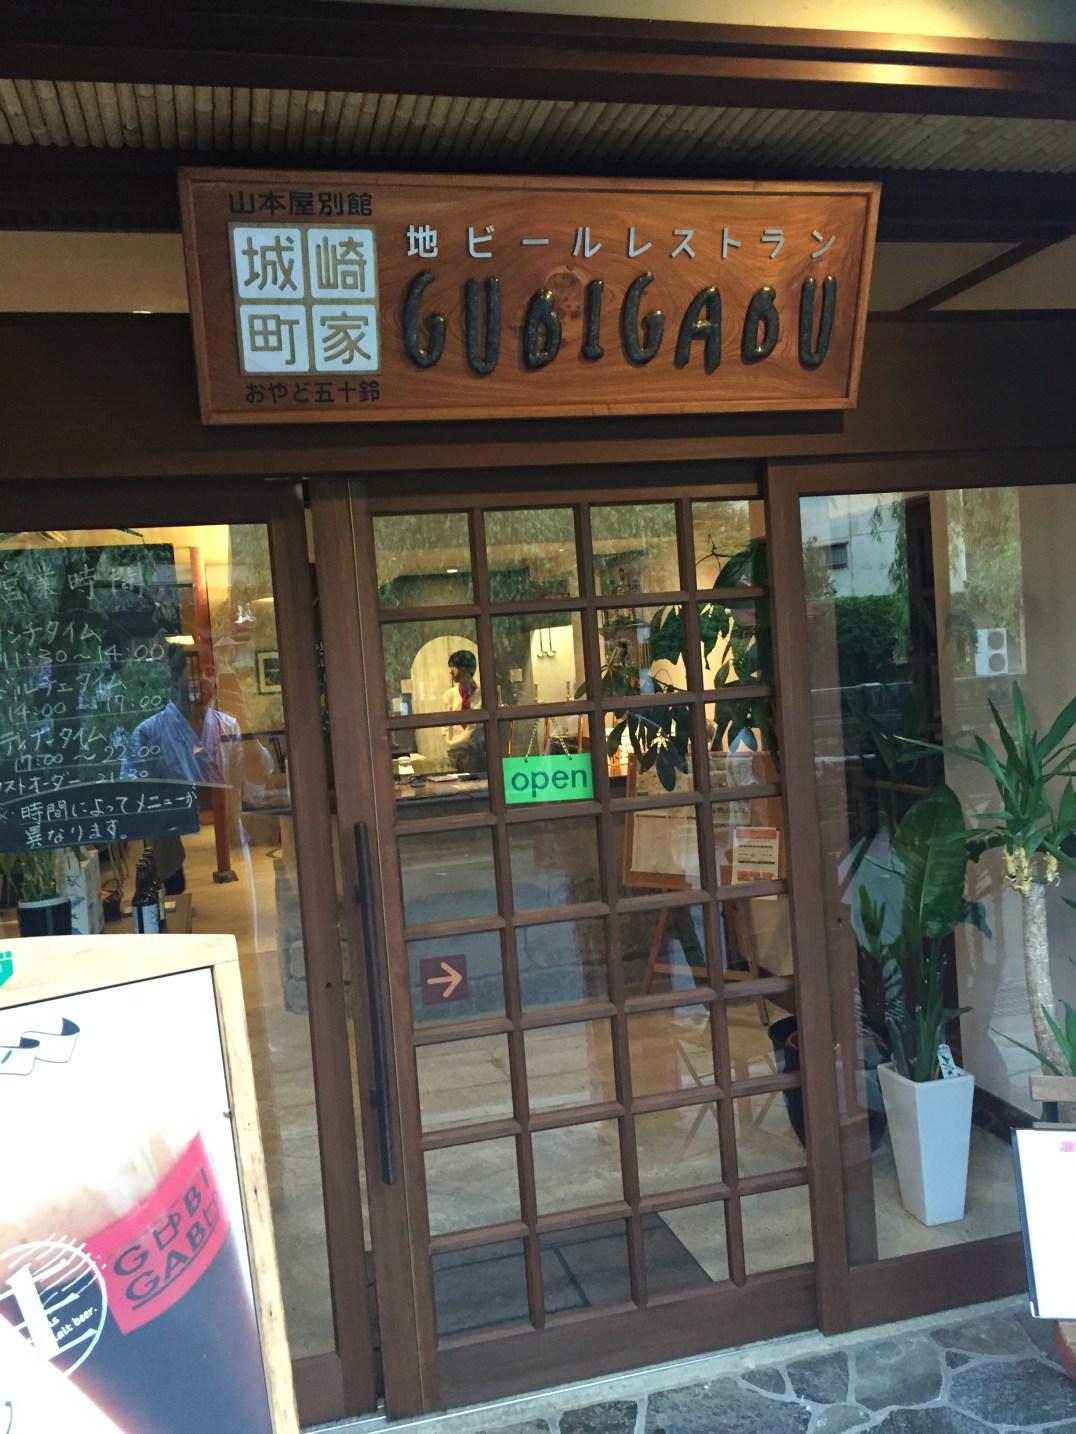 Gubigabu restaurant